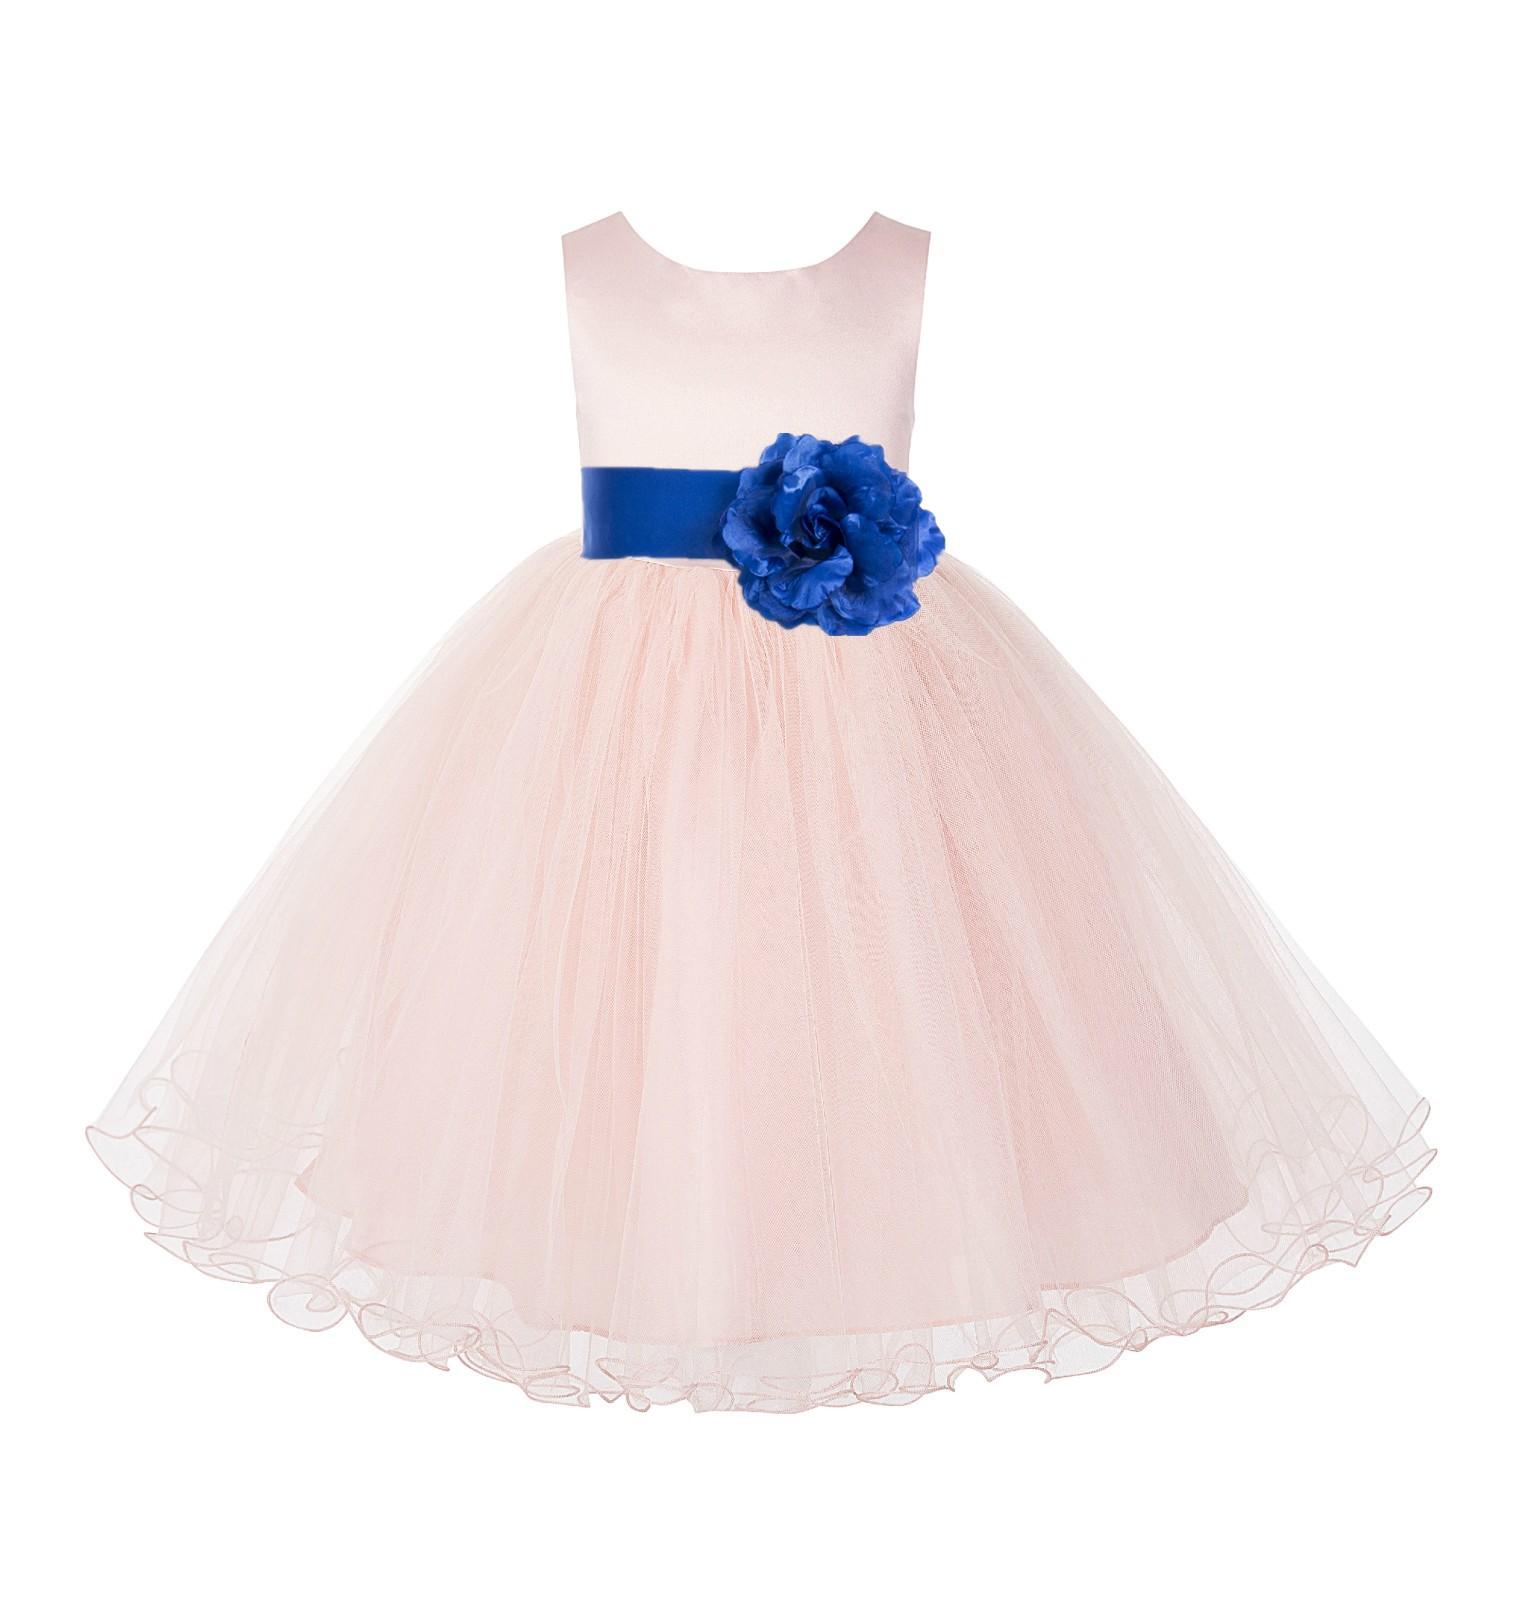 Blush Pink / Royal Blue Tulle Rattail Edge Flower Girl Dress Pageant Recital 829S